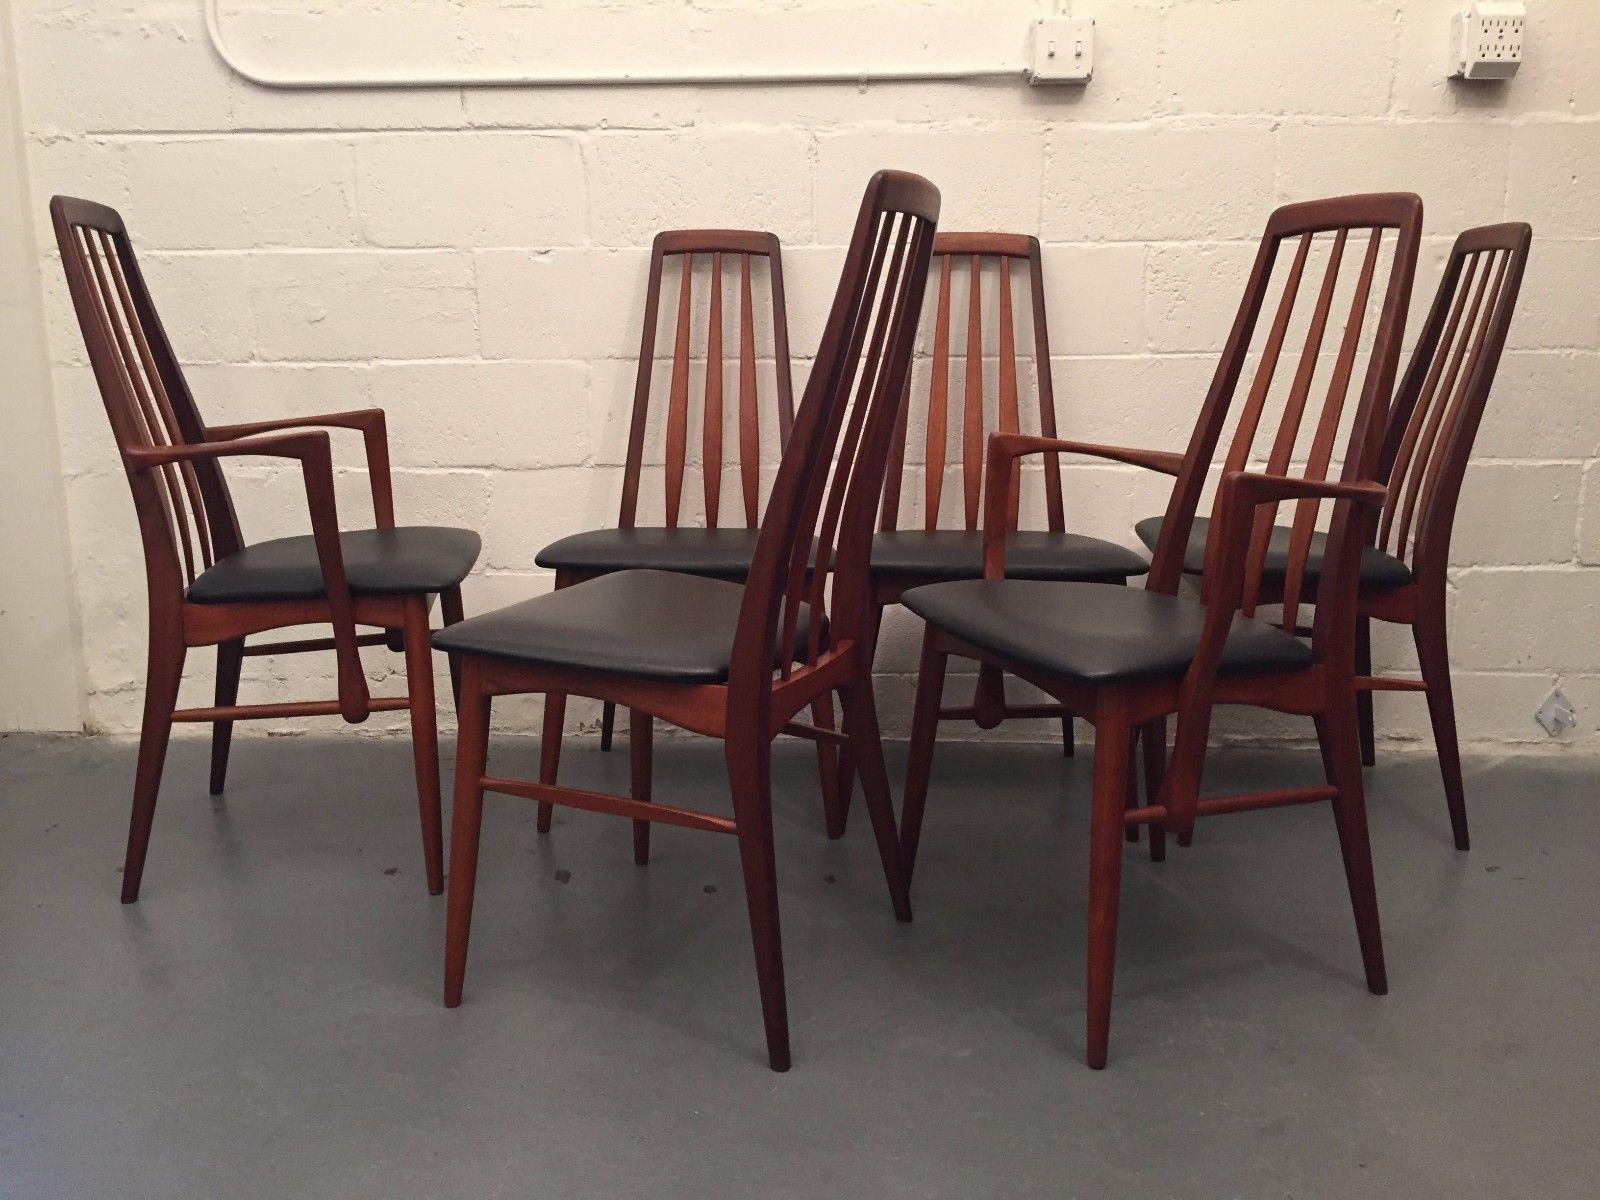 Mid Century Danish Modern Dining Chairs Koefoeds Hornslet Eva Teak